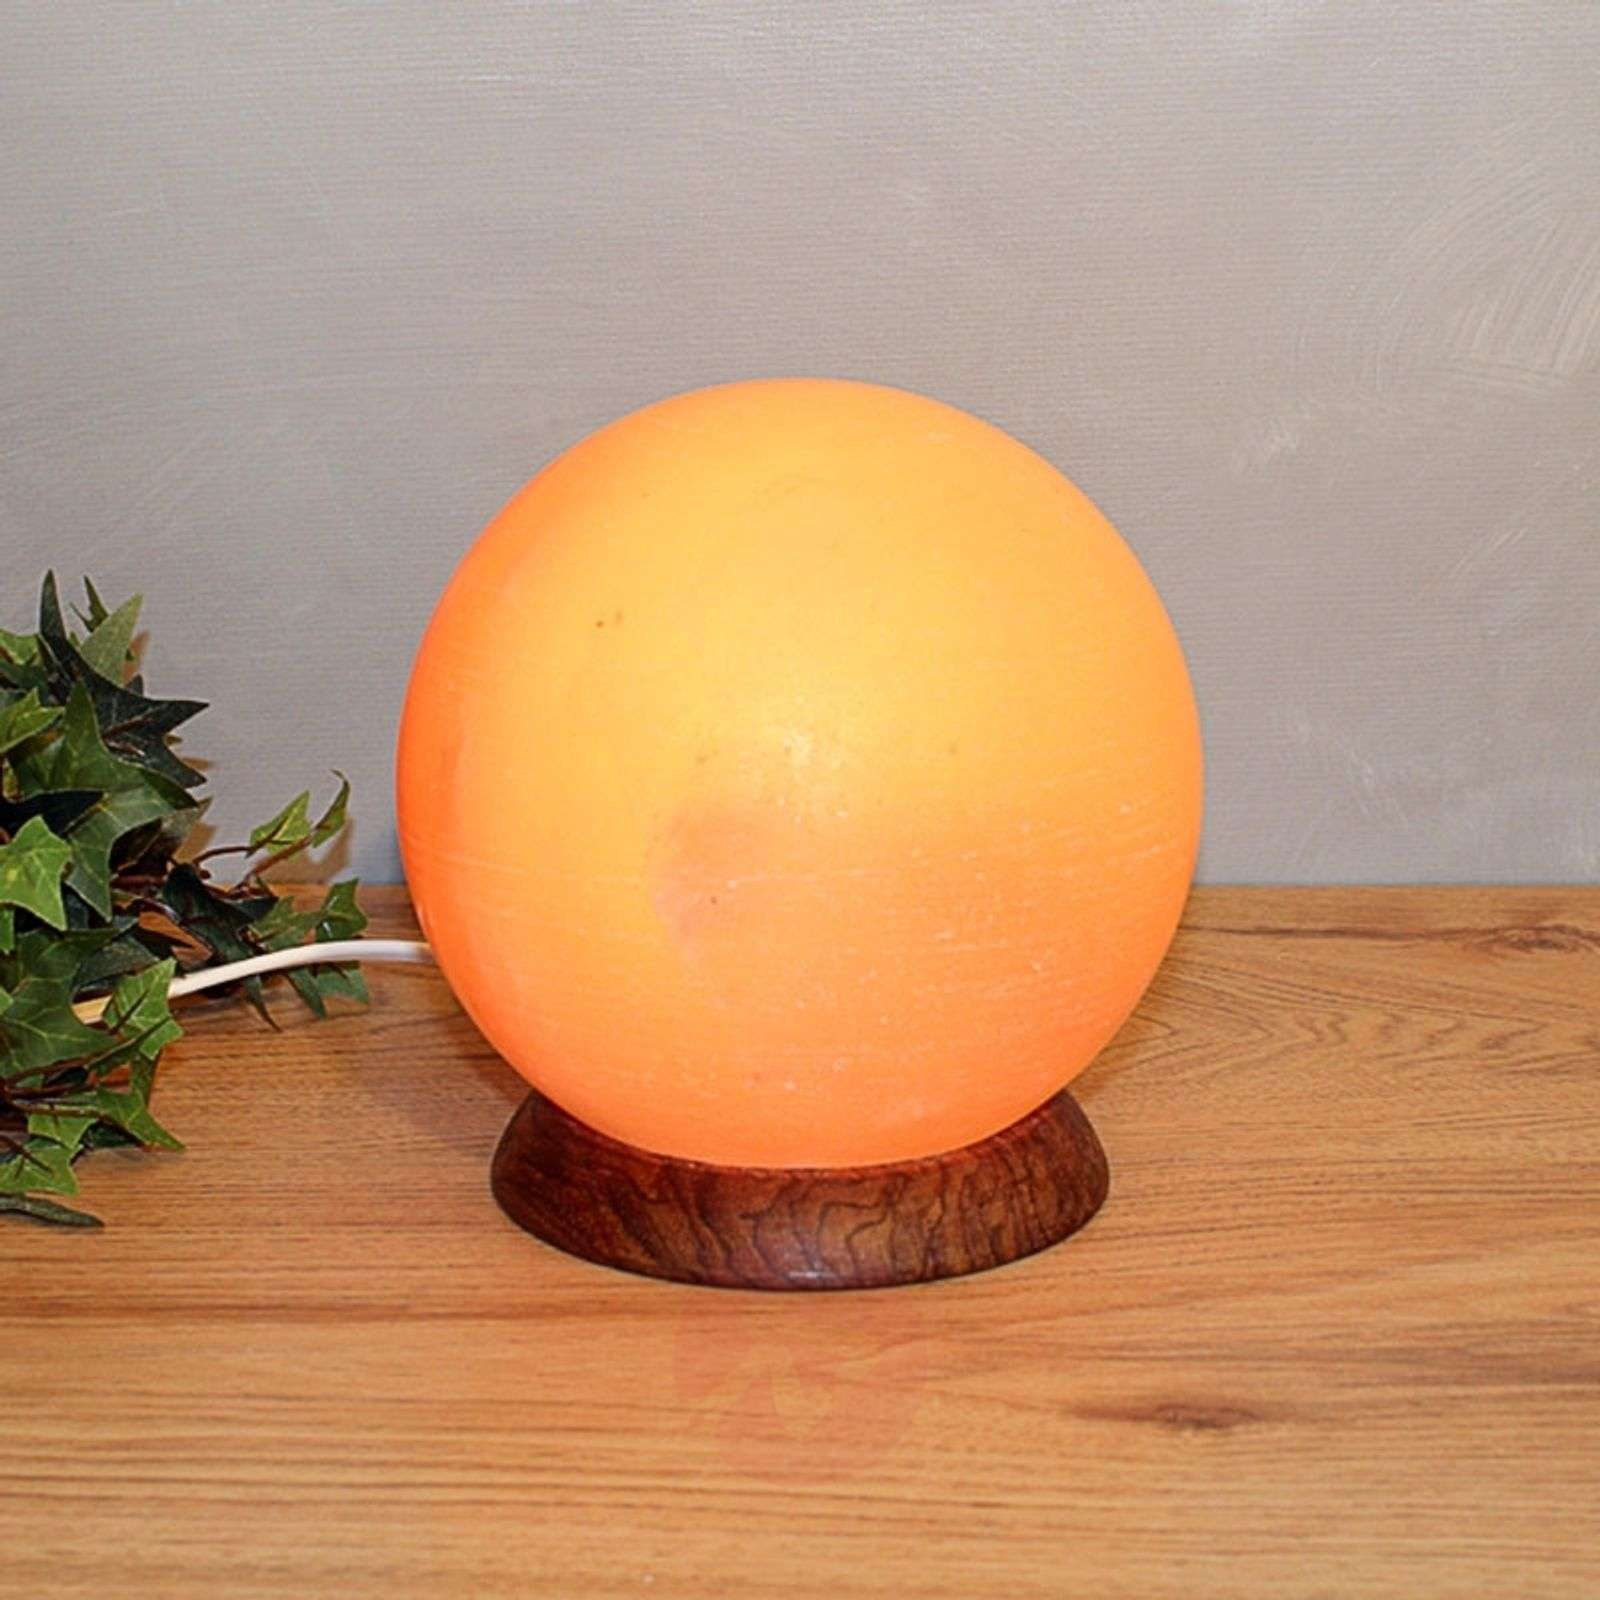 PLANETO round salt lamp-9608004-01